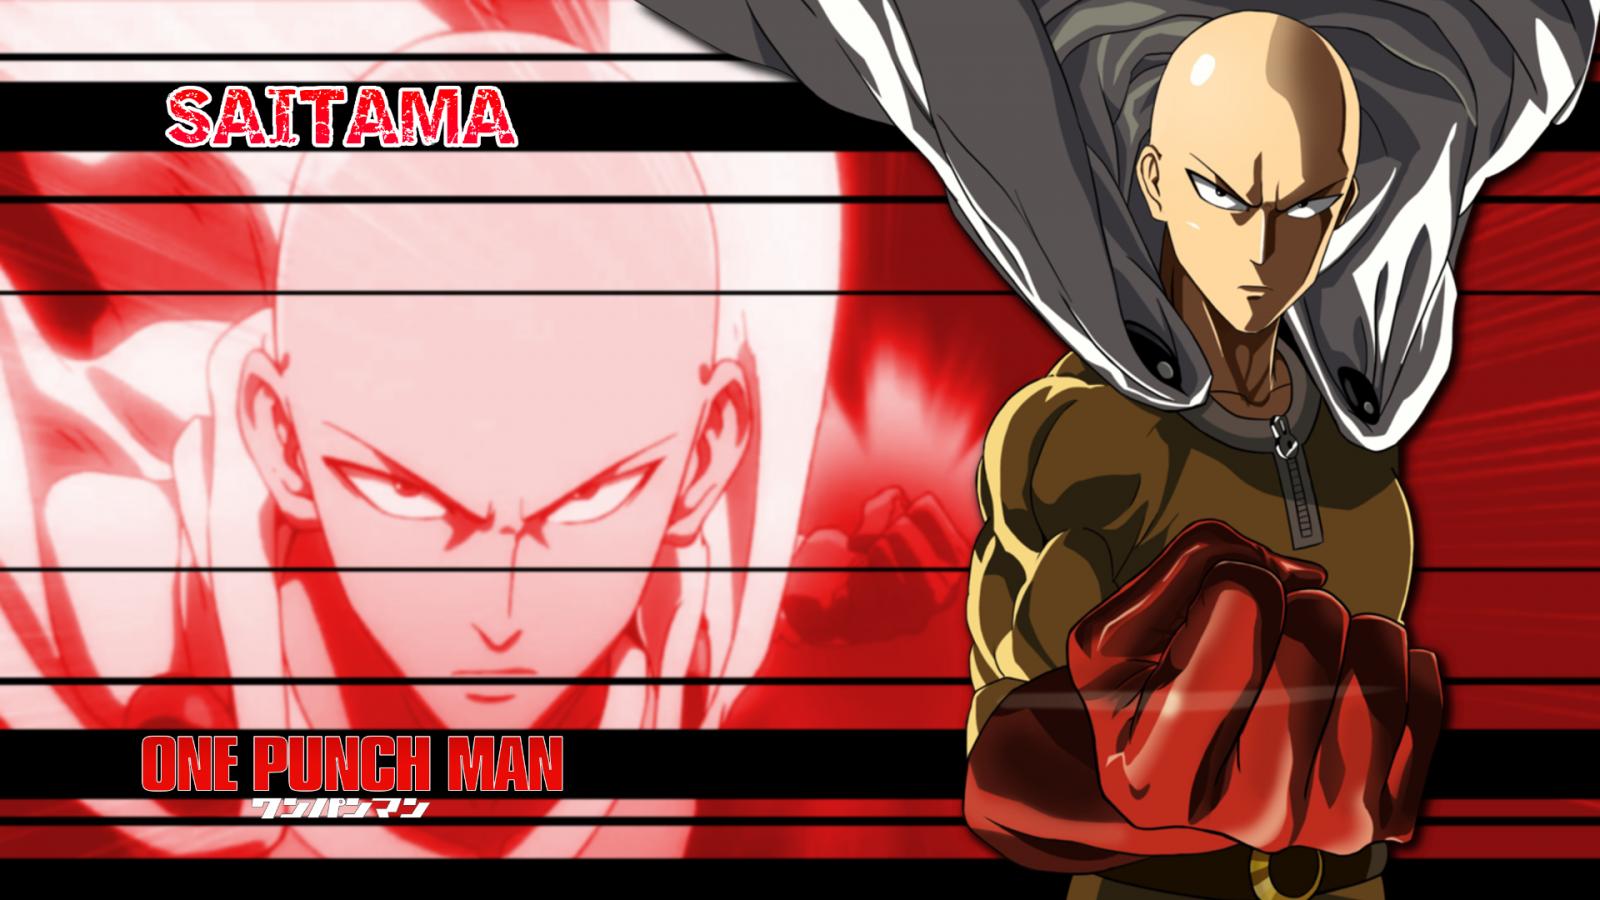 Free Download One Punch Man Saitama Wallpaper6 1920x1080 For